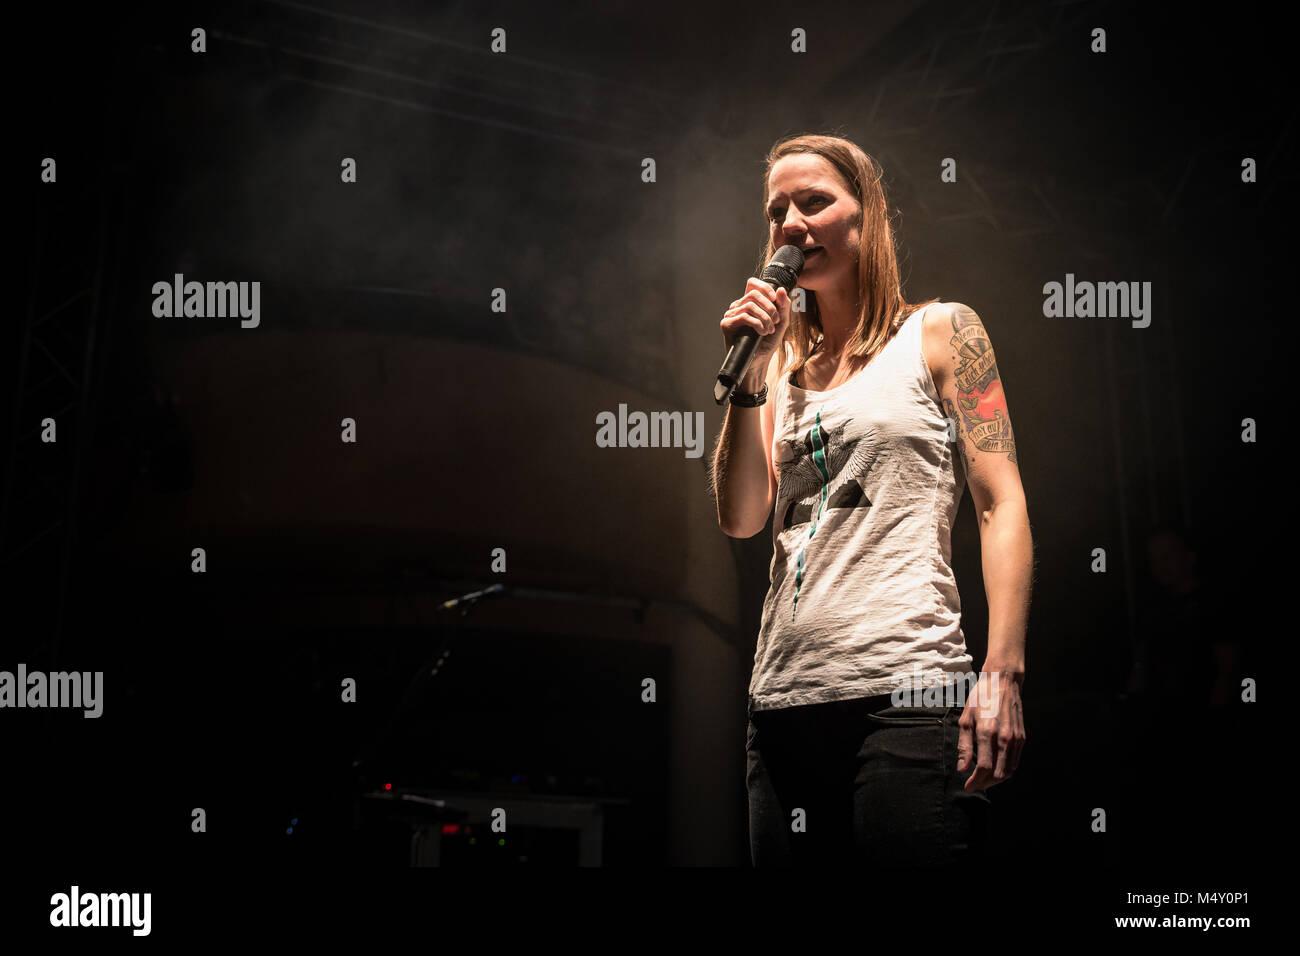 Christina Stürmer - Stock Image